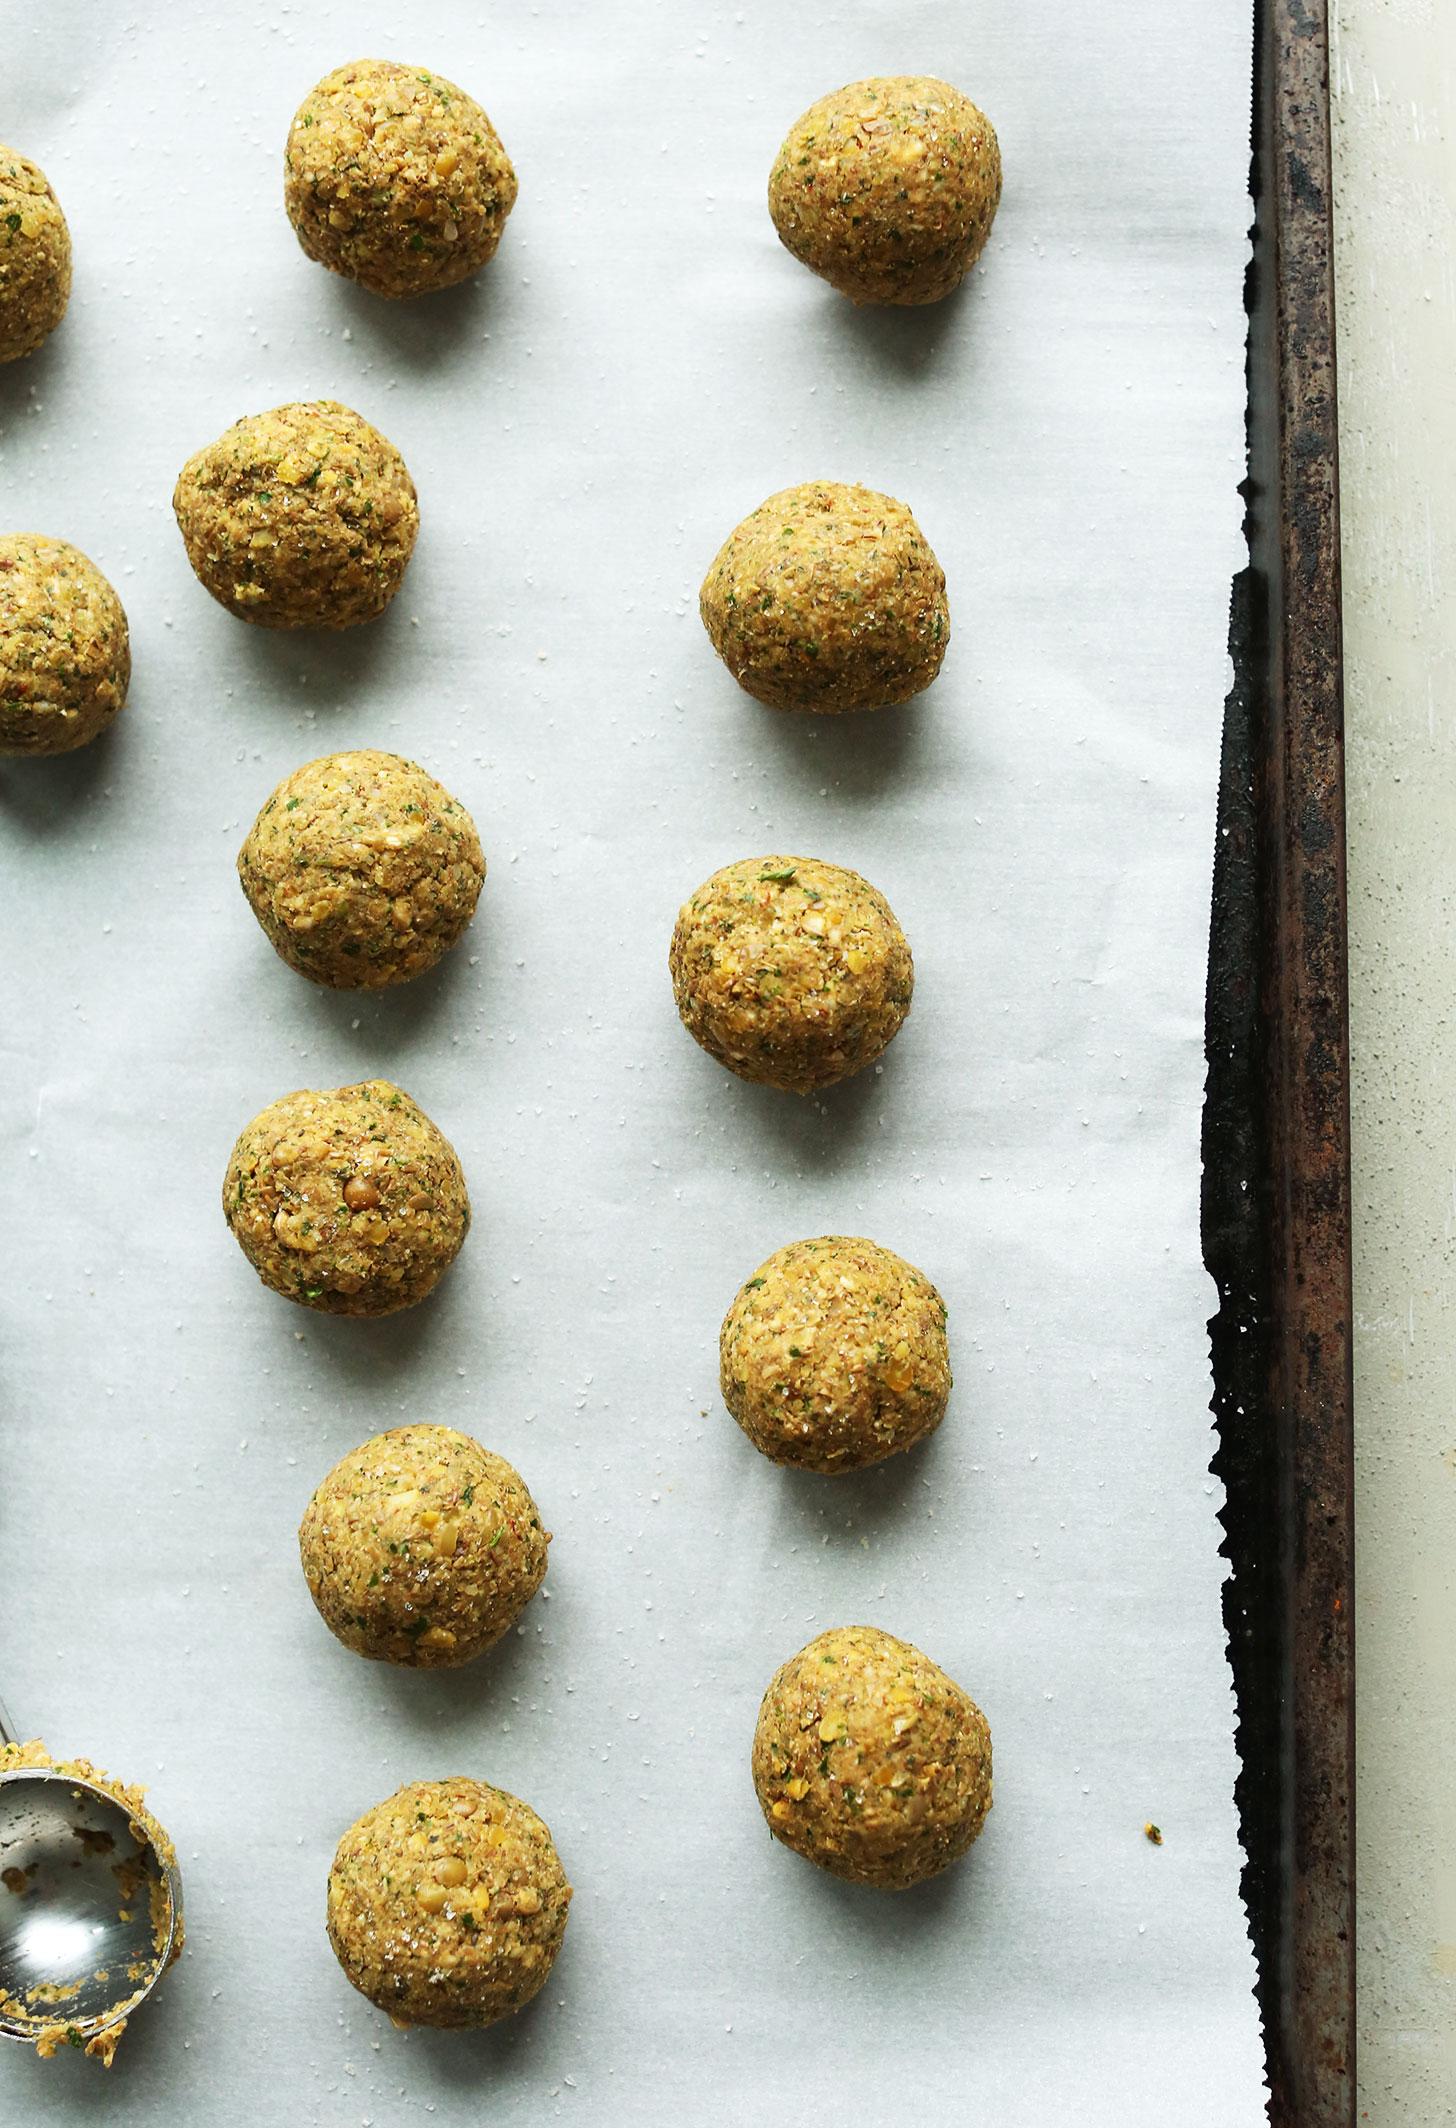 Parchment-lined baking sheet with freshly rolled vegan lentil meatballs